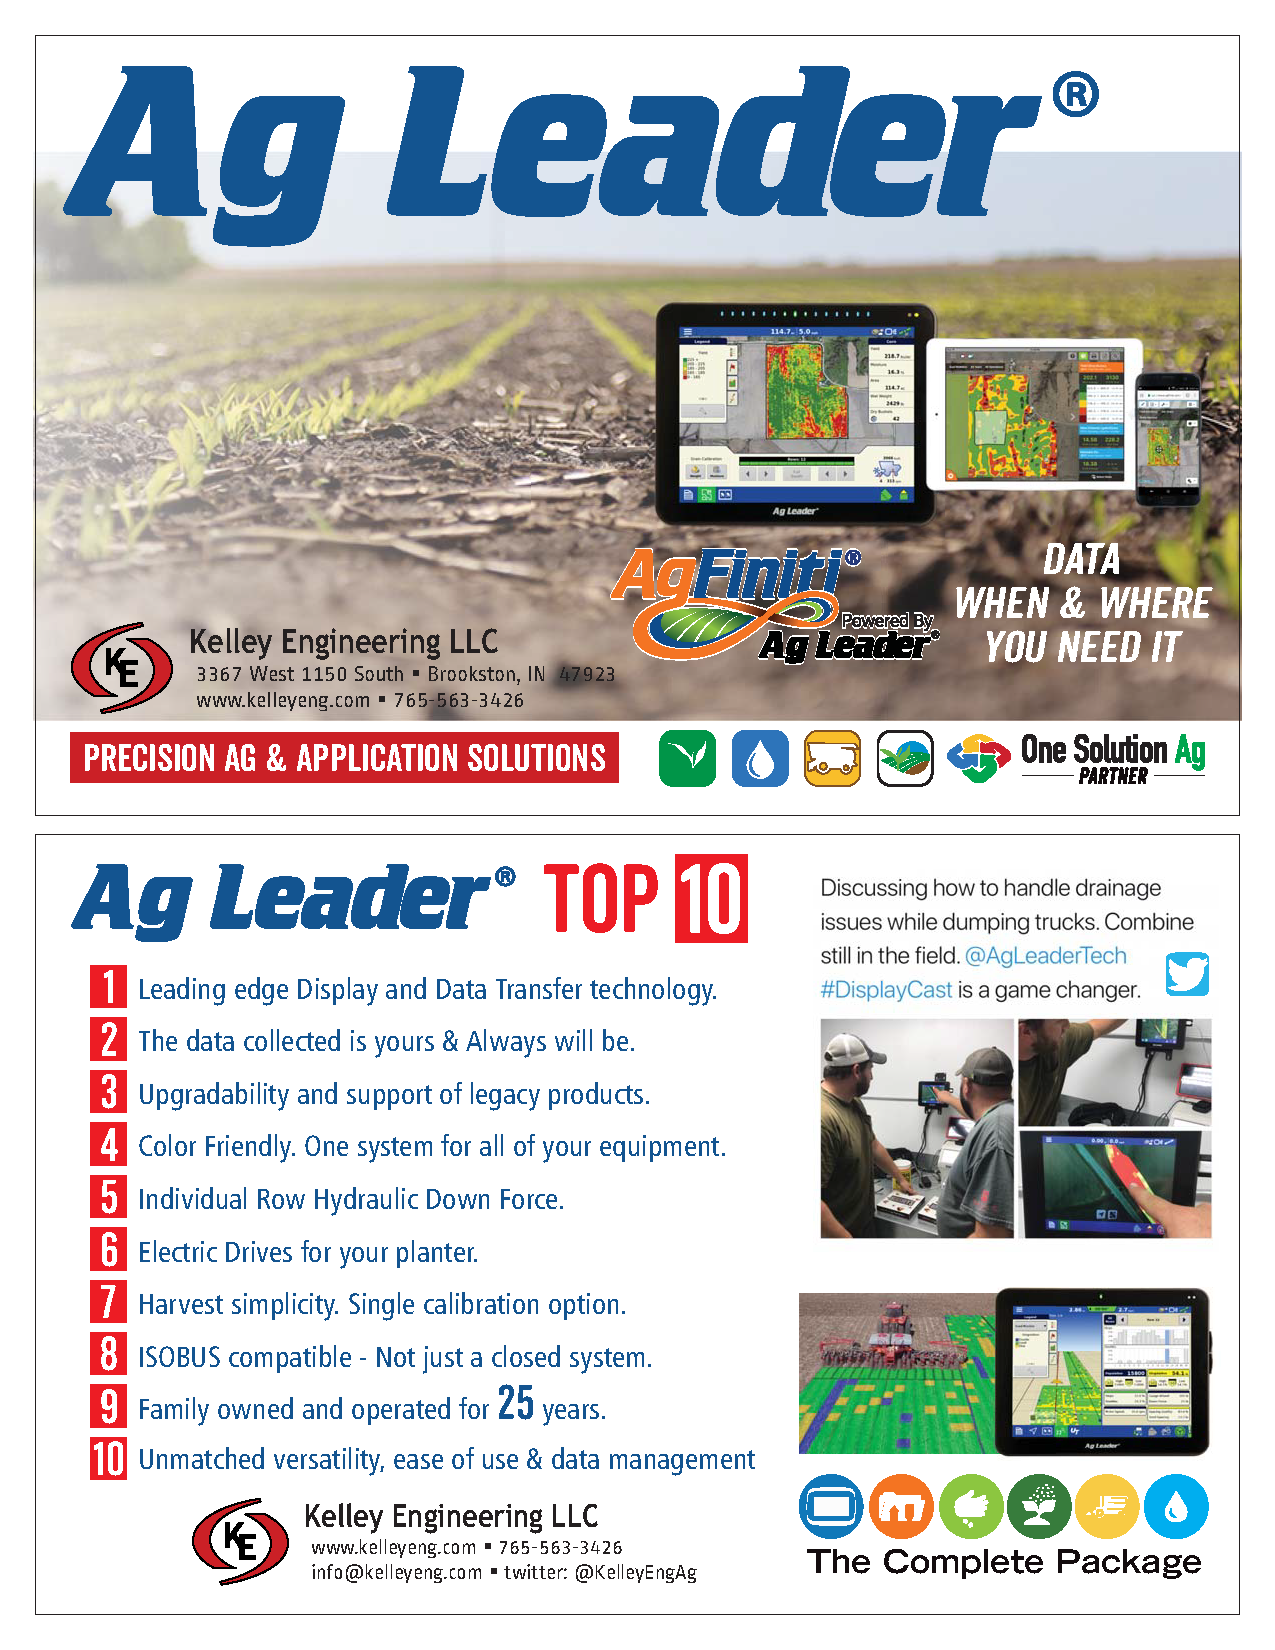 Ag Leader - Top 10